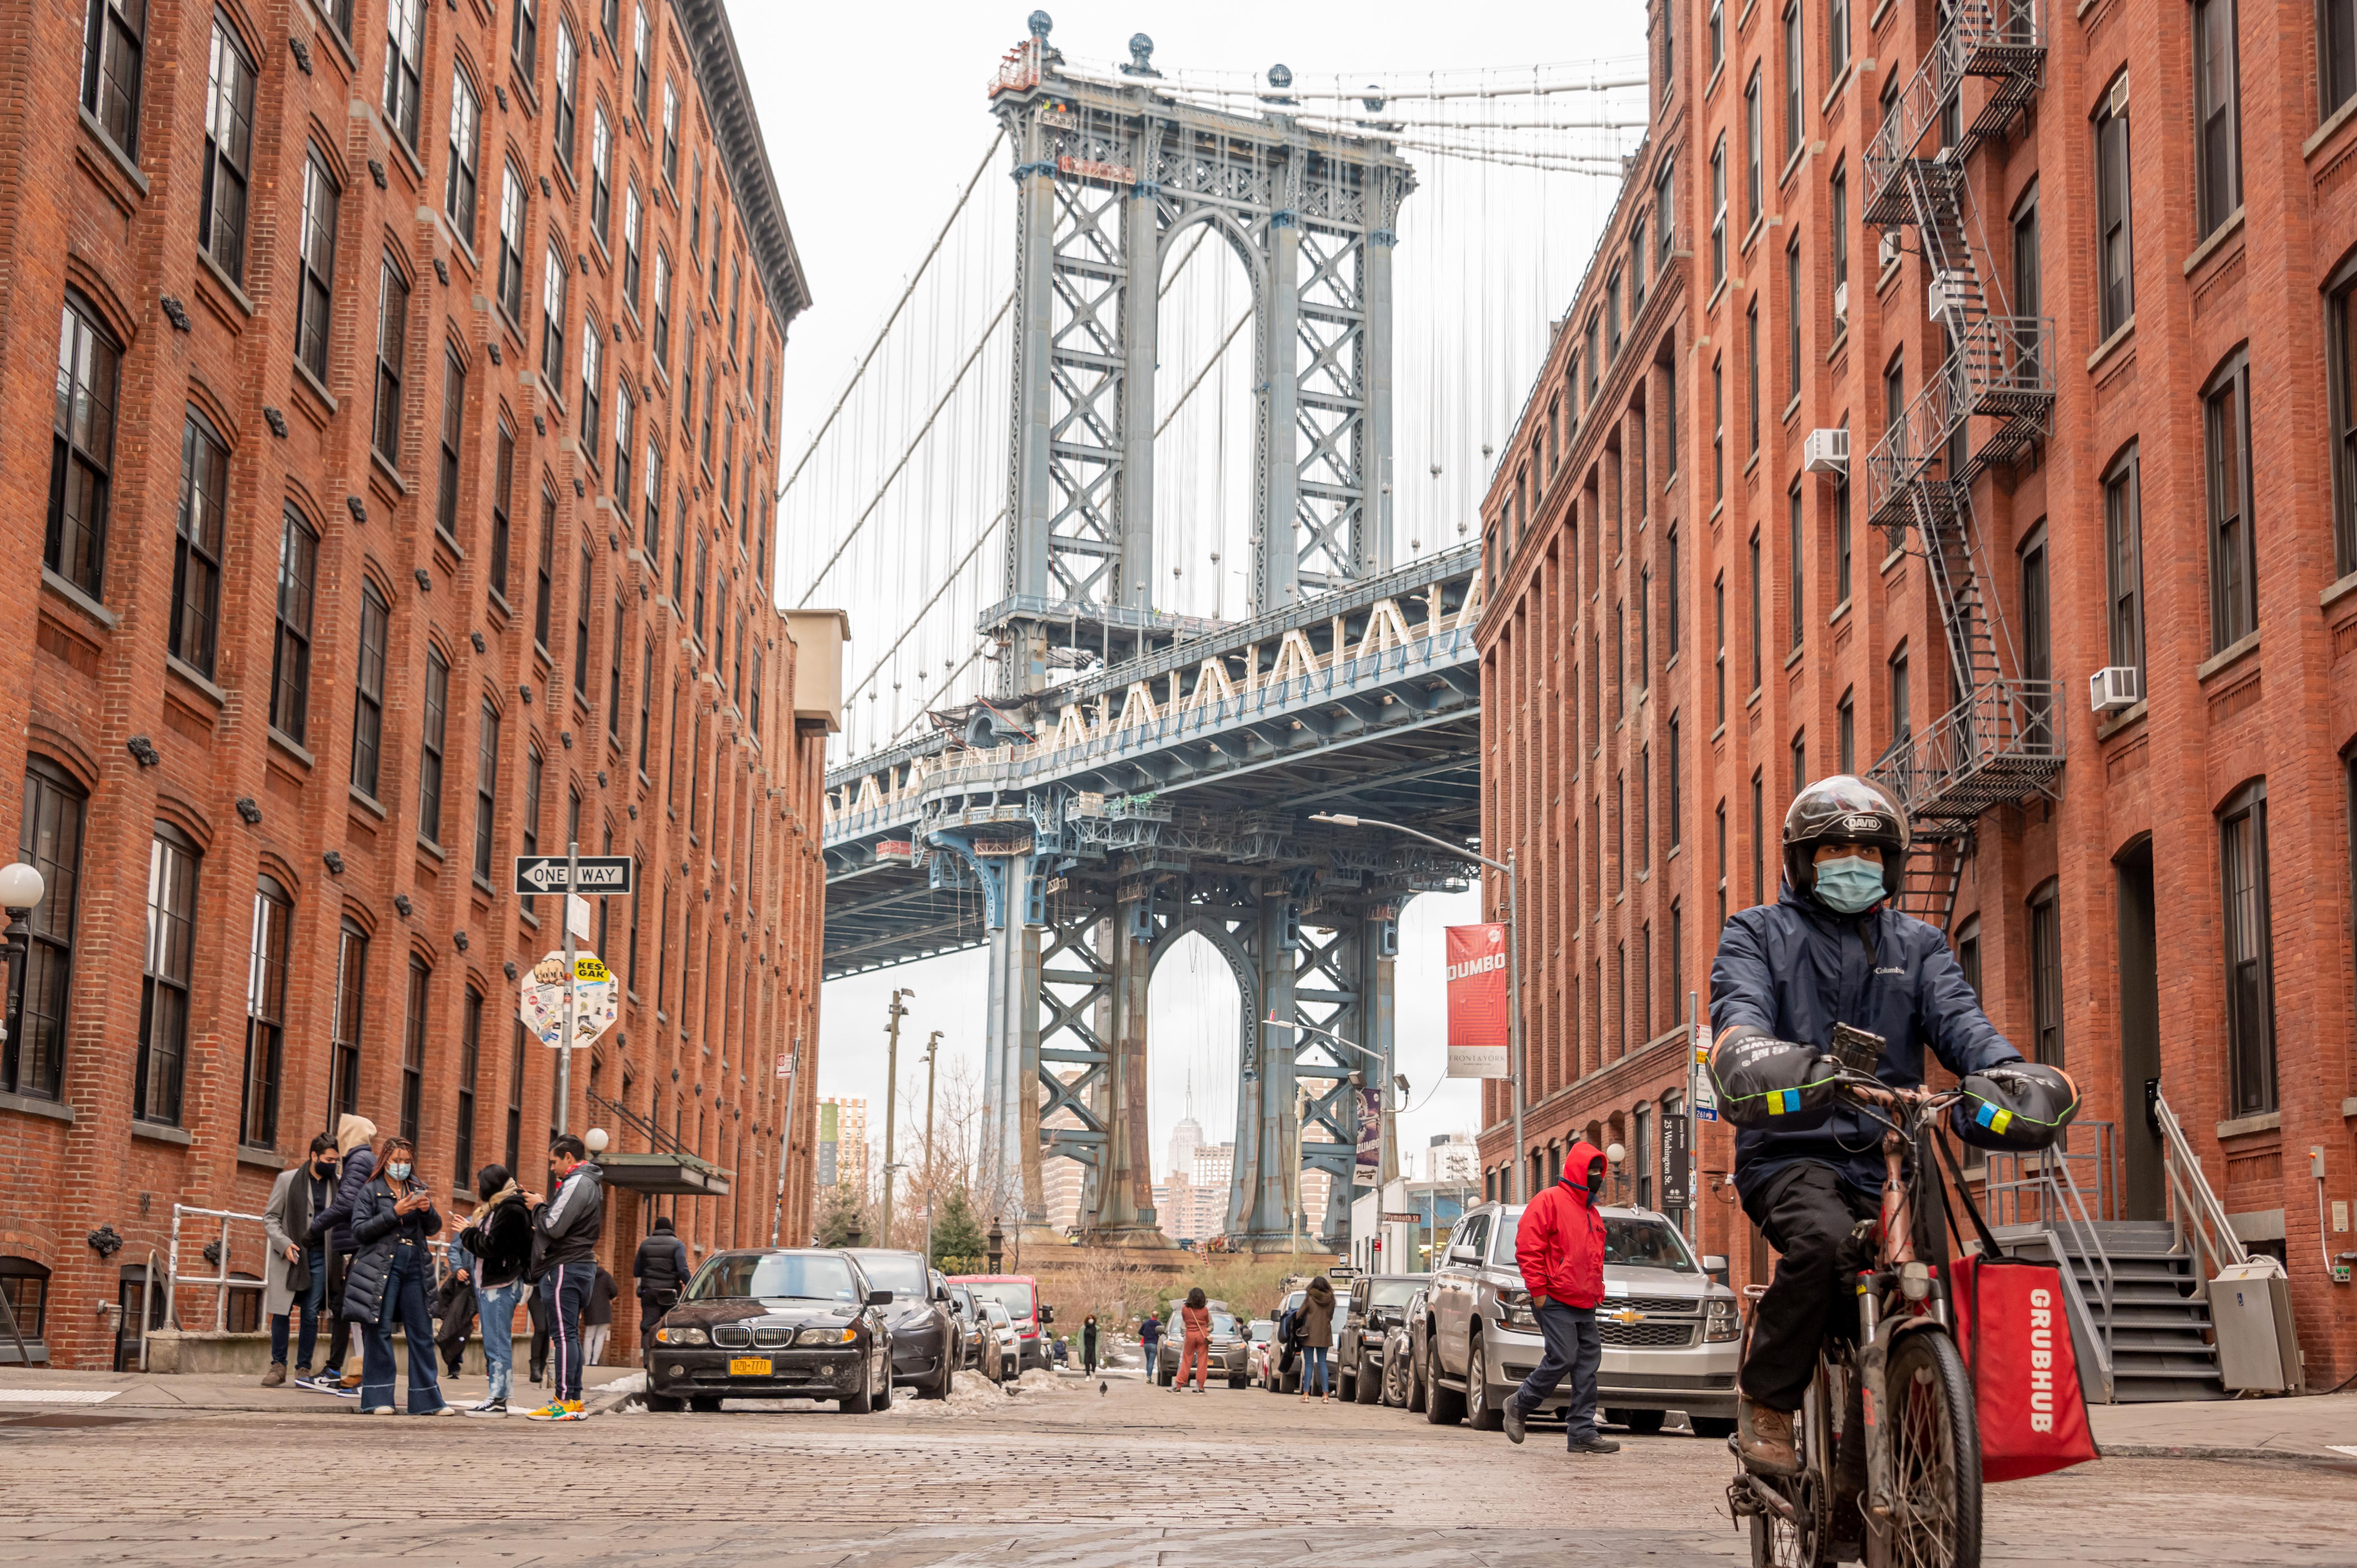 DoorDash, Uber Eats and Grubhub sue NYC over restaurant fee limits